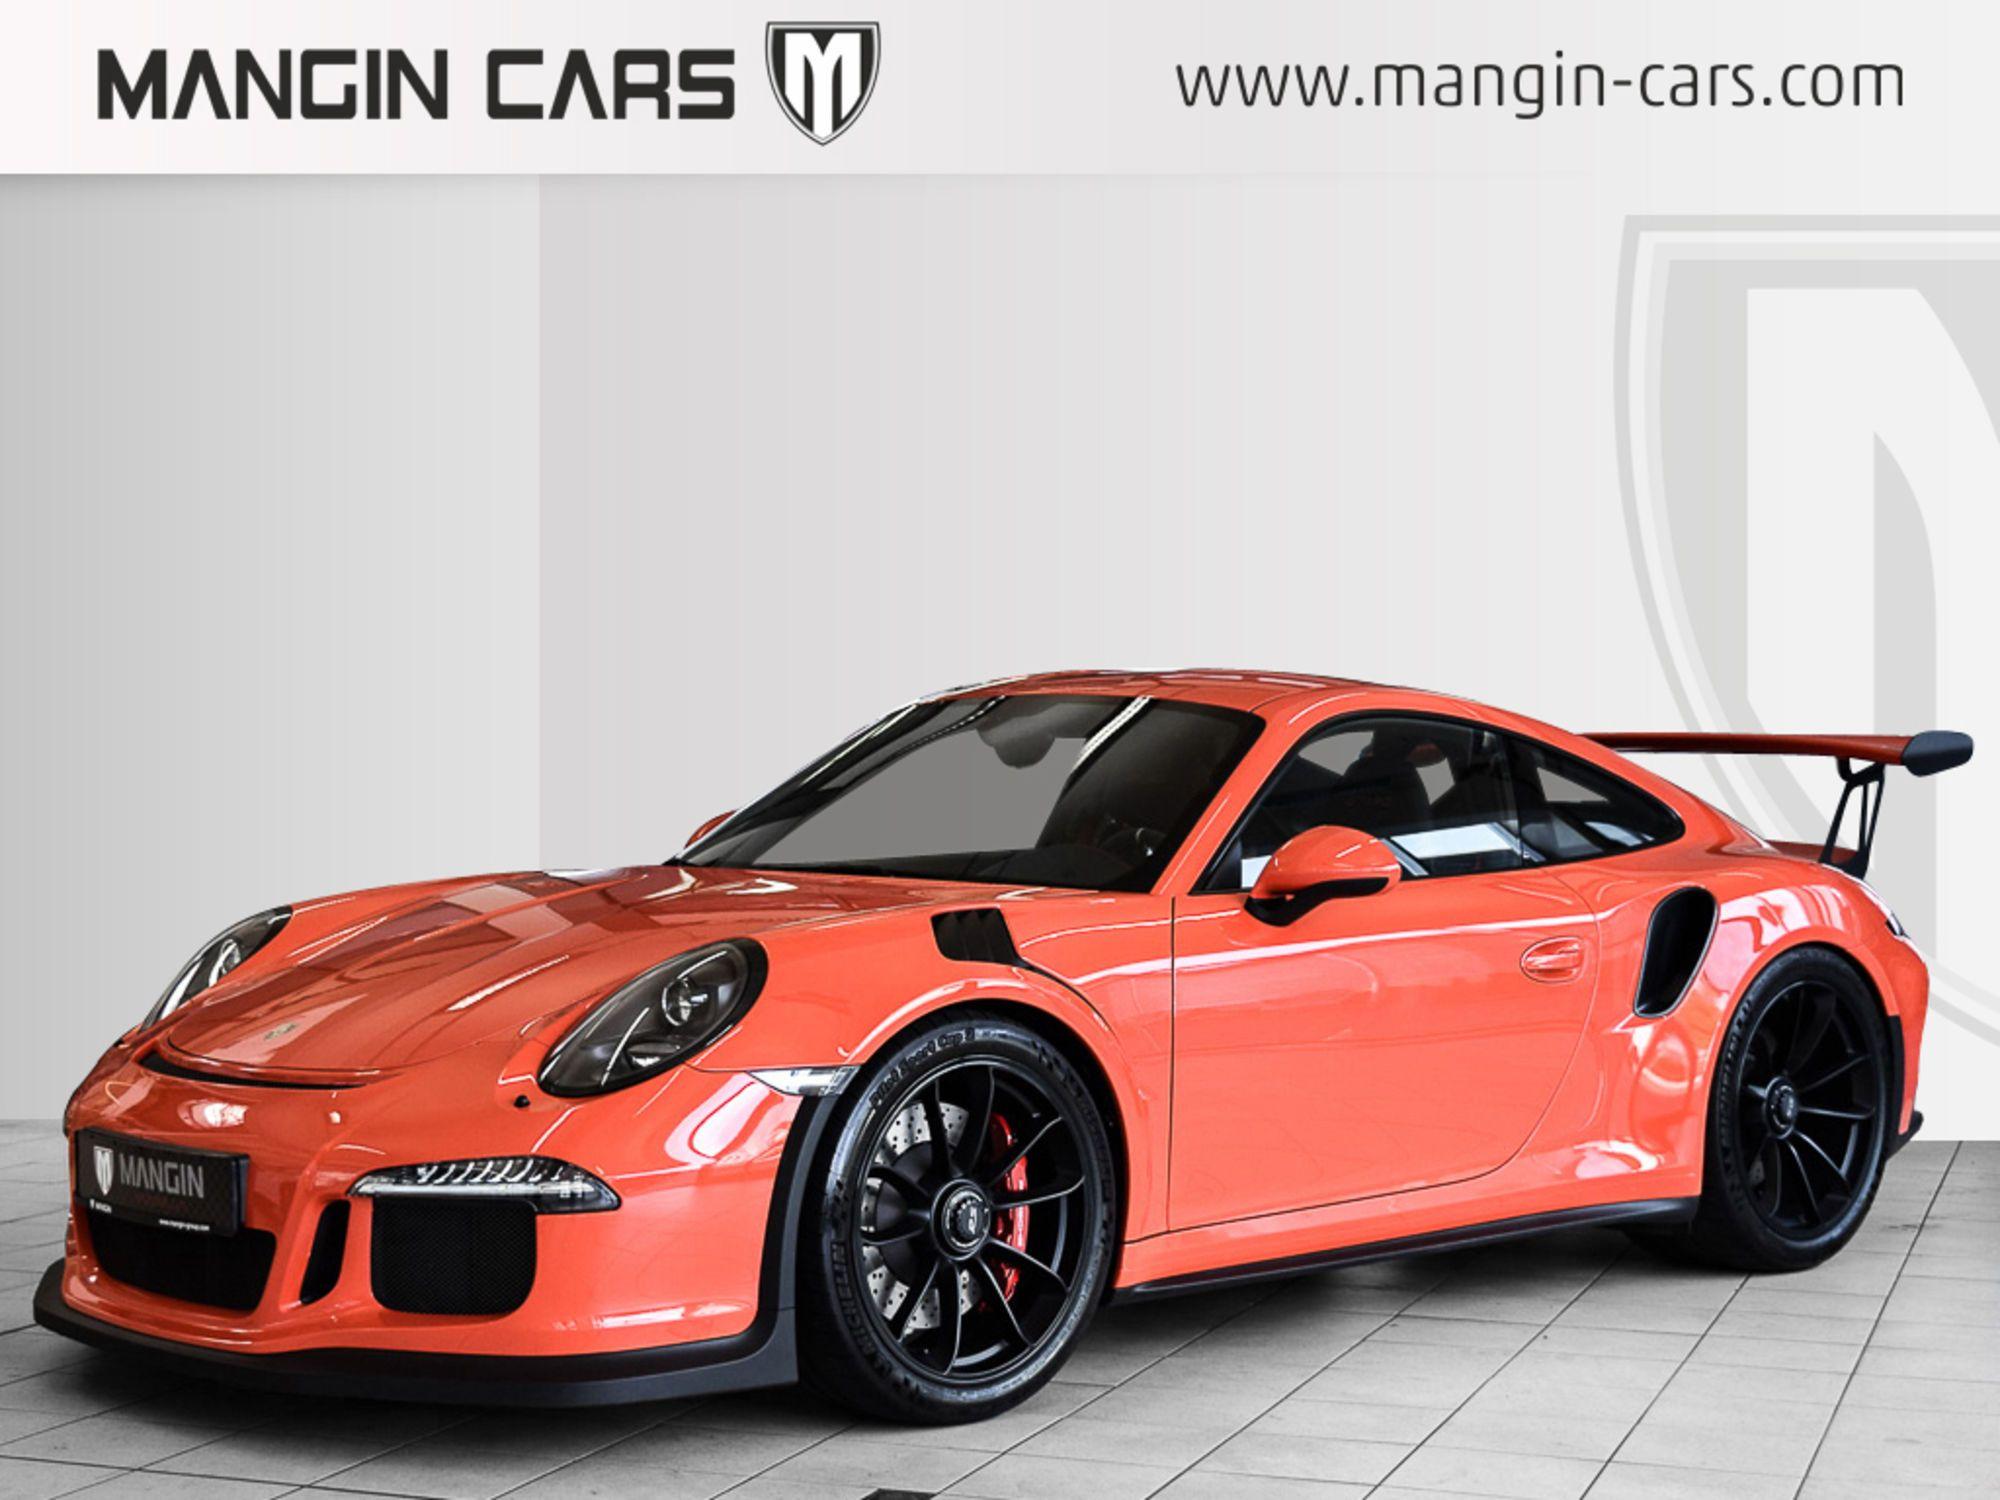 Pin By Lukeram On Vehicles And Bikes Porsche Porsche 911 Gt3 Porsche 911